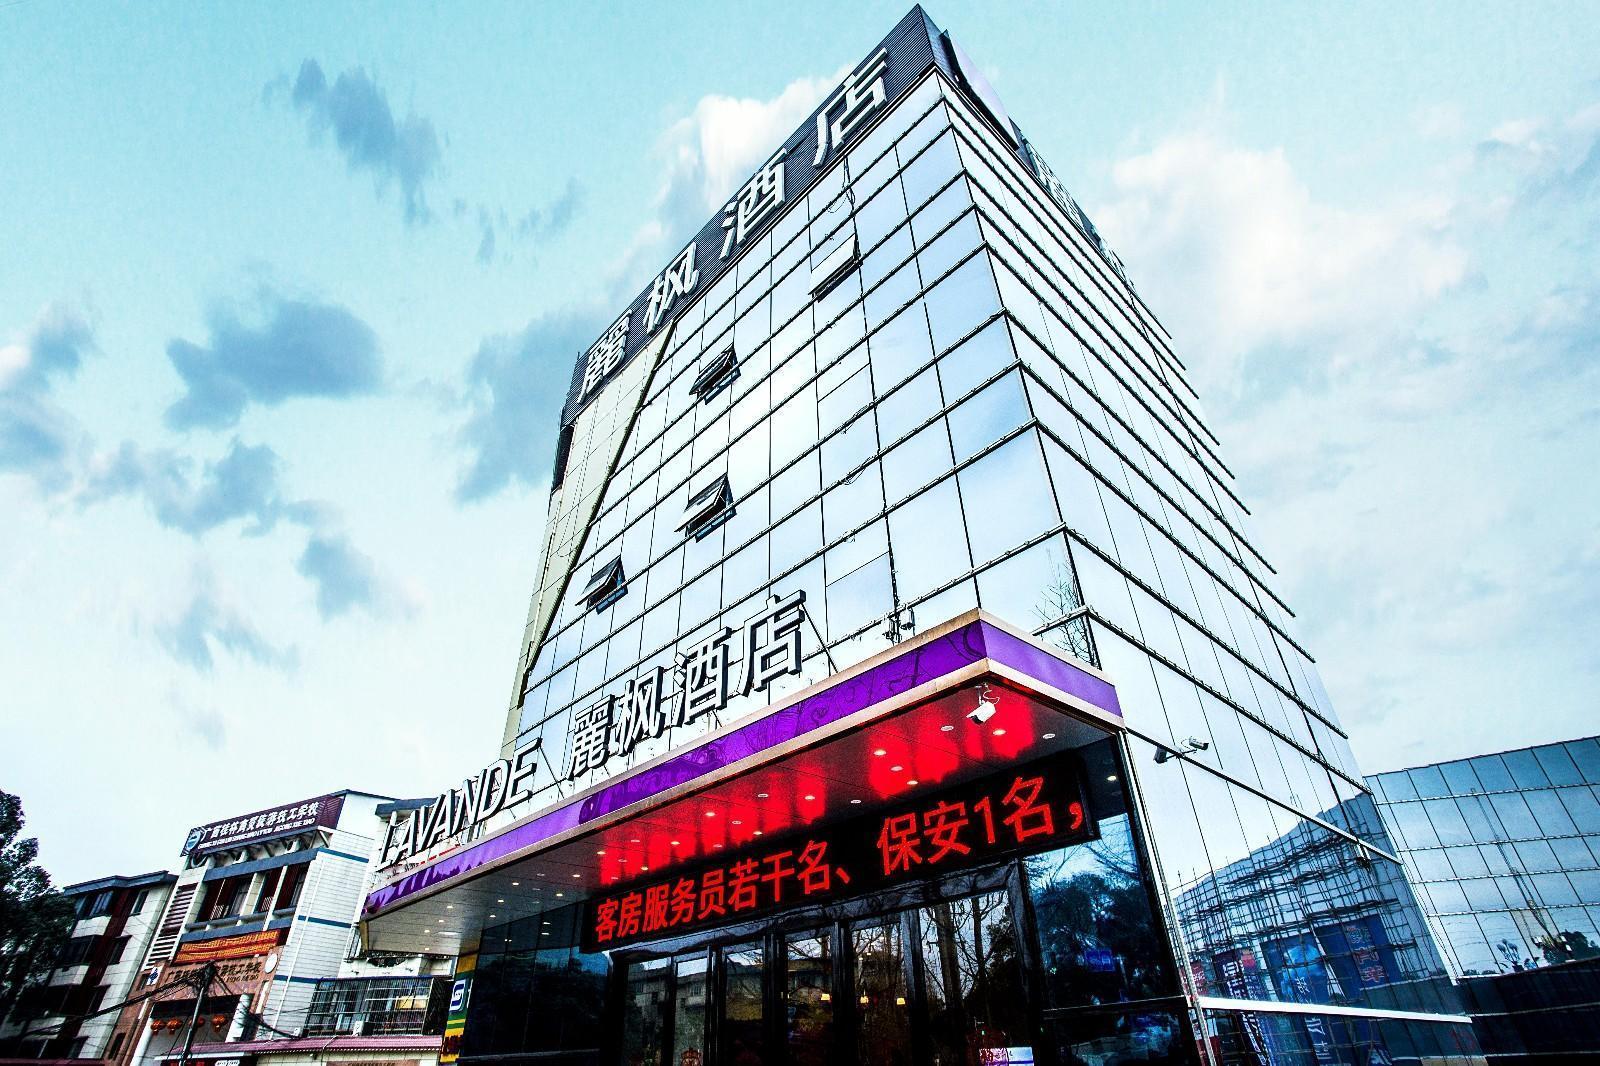 Lavande Hotels�Guilin Wanfu Plaza